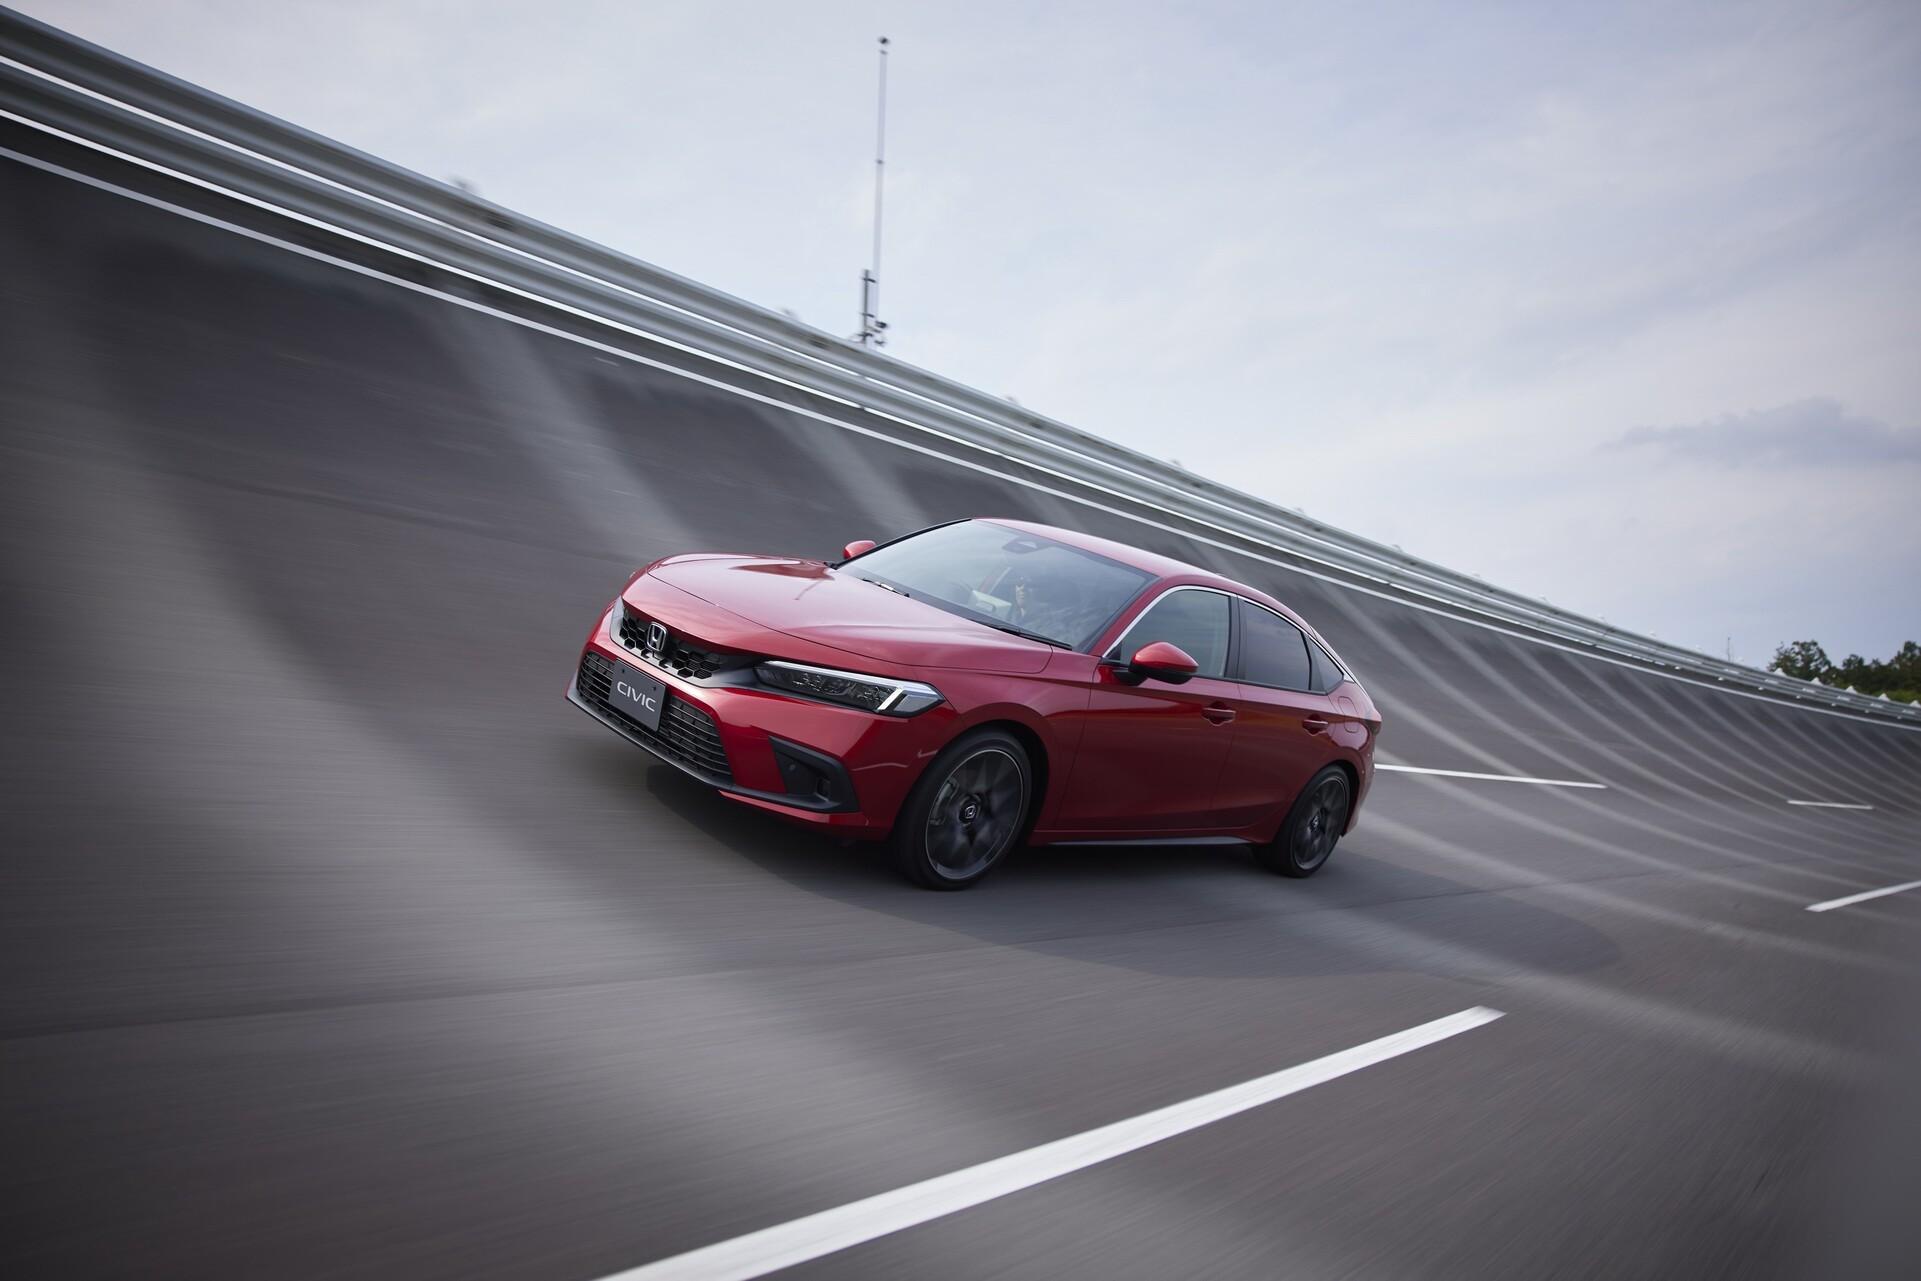 Foto de Honda Civic Hatchback 2022 (17/18)